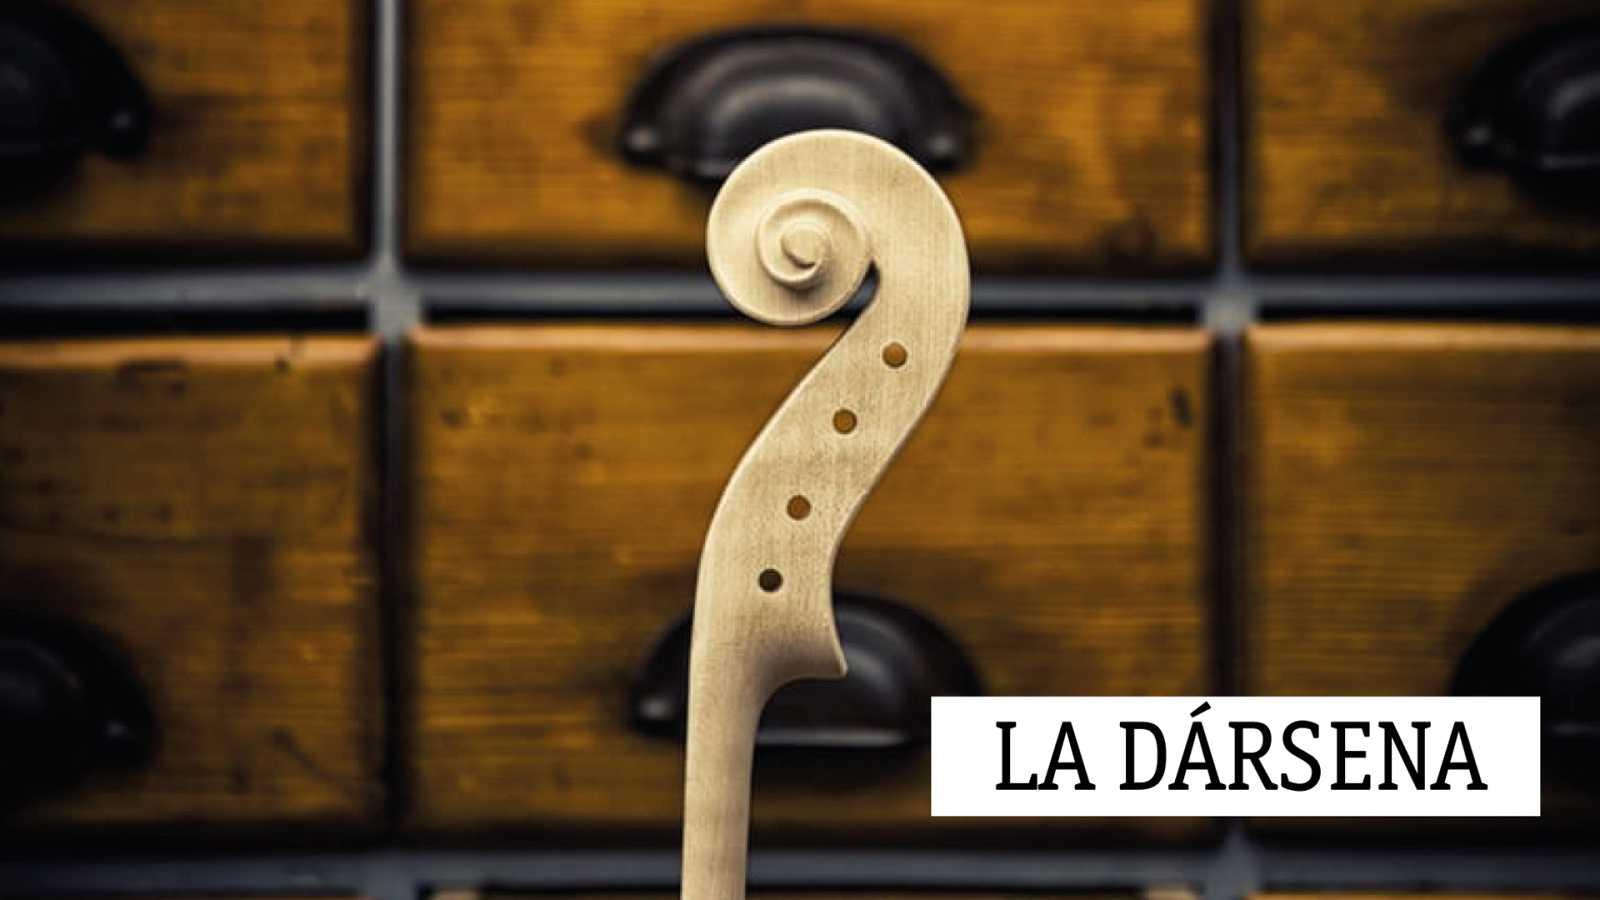 La dársena - Concerto 1700 - 03/03/20 - escuchar ahora